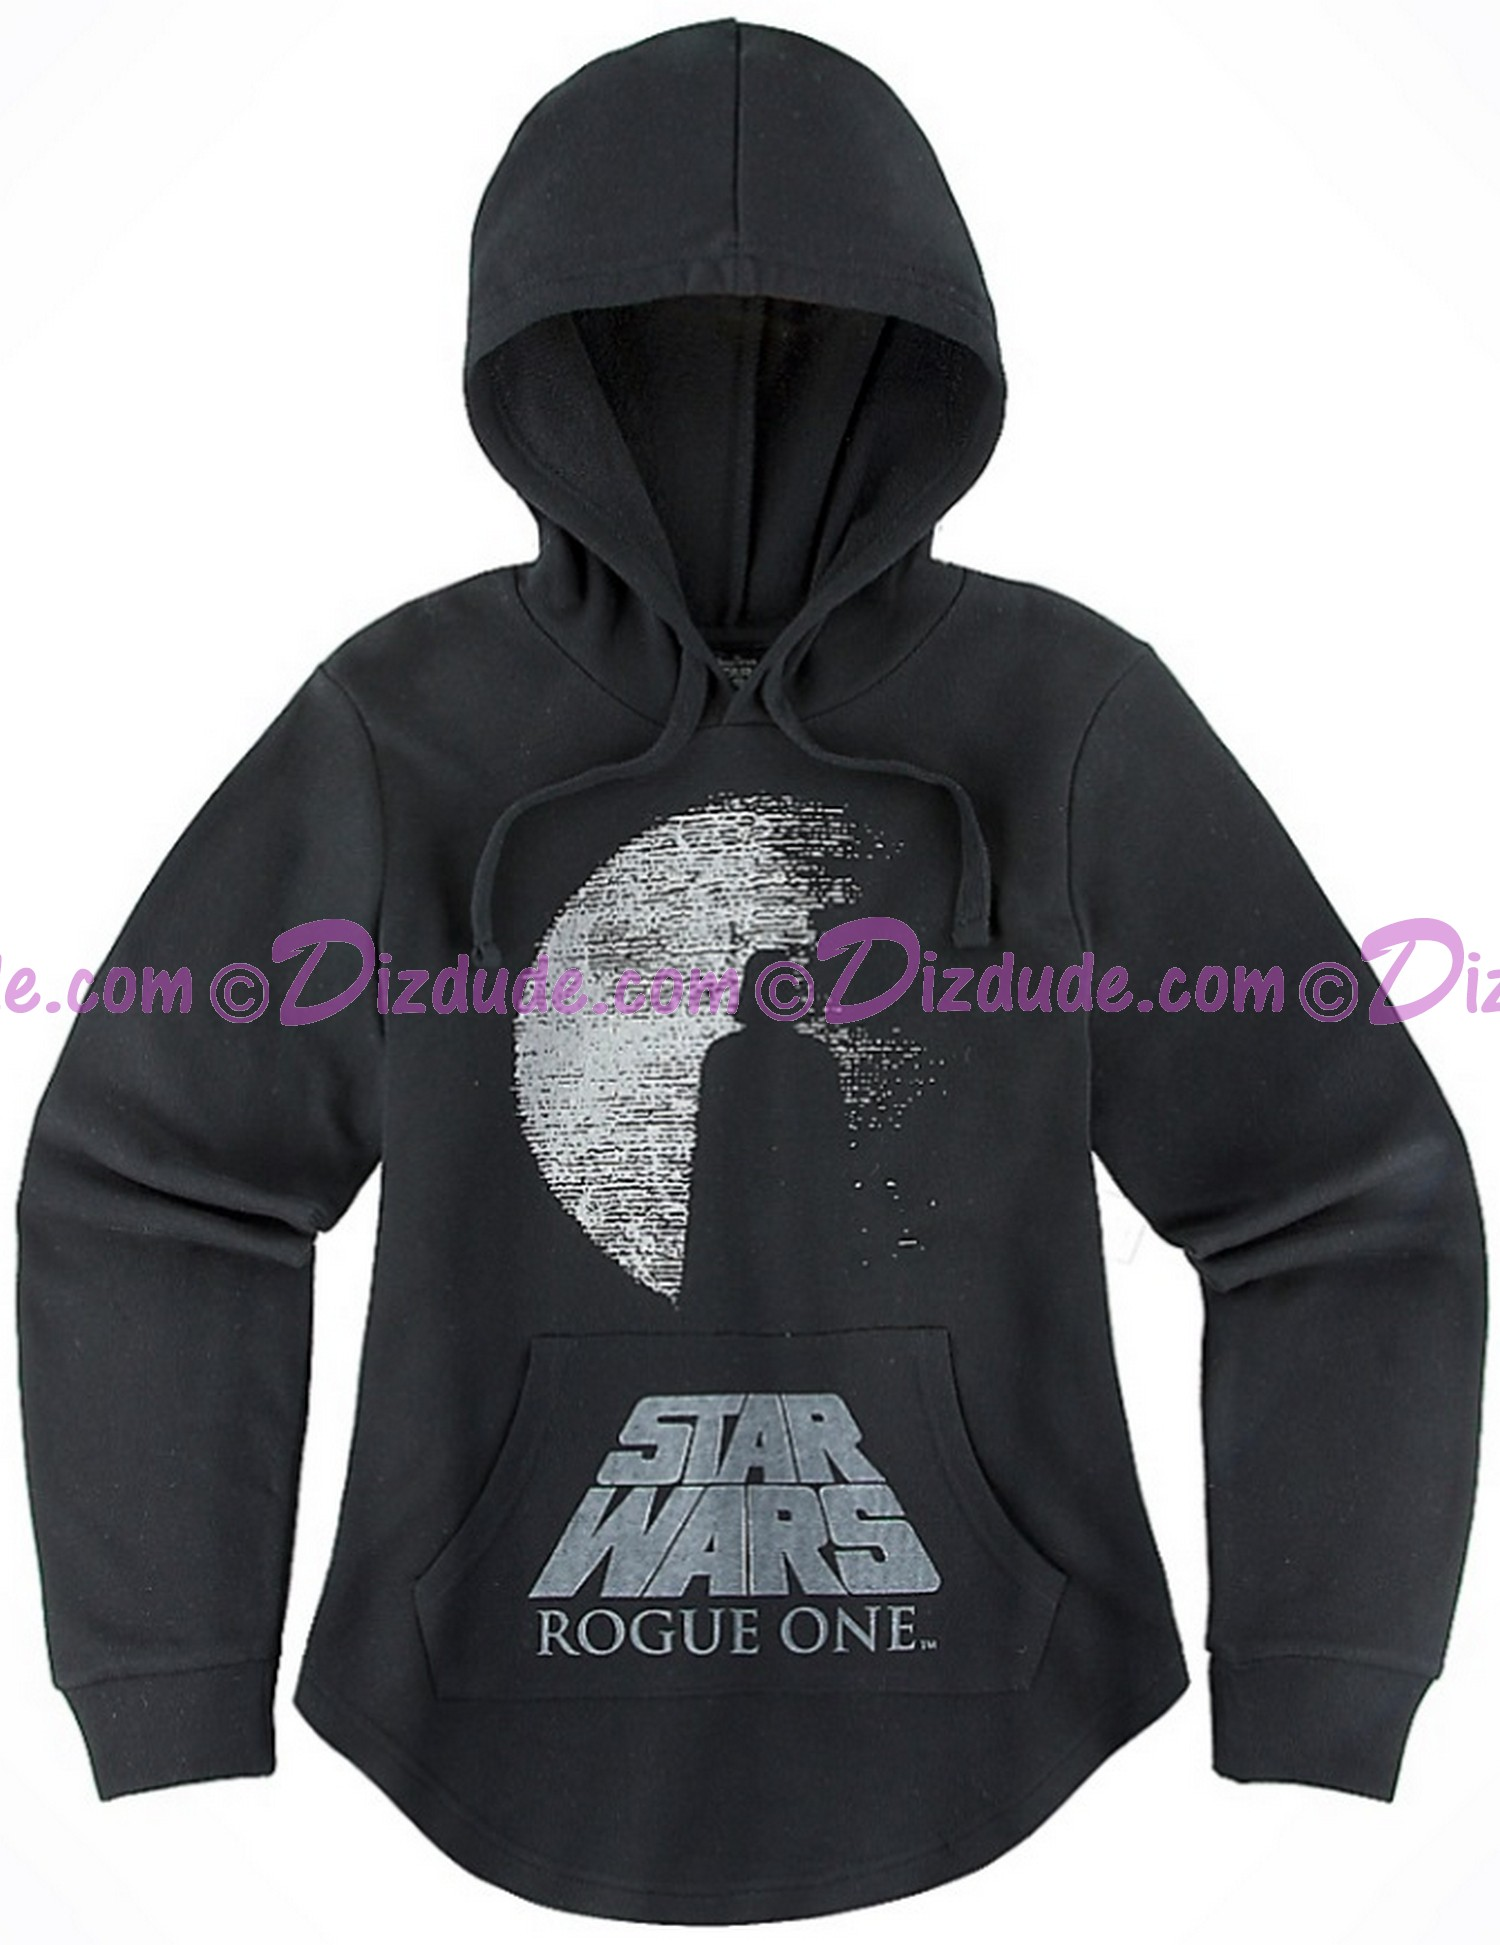 Rogue One Darth Vader Hoodie - Disney's Star Wars © Dizdude.com